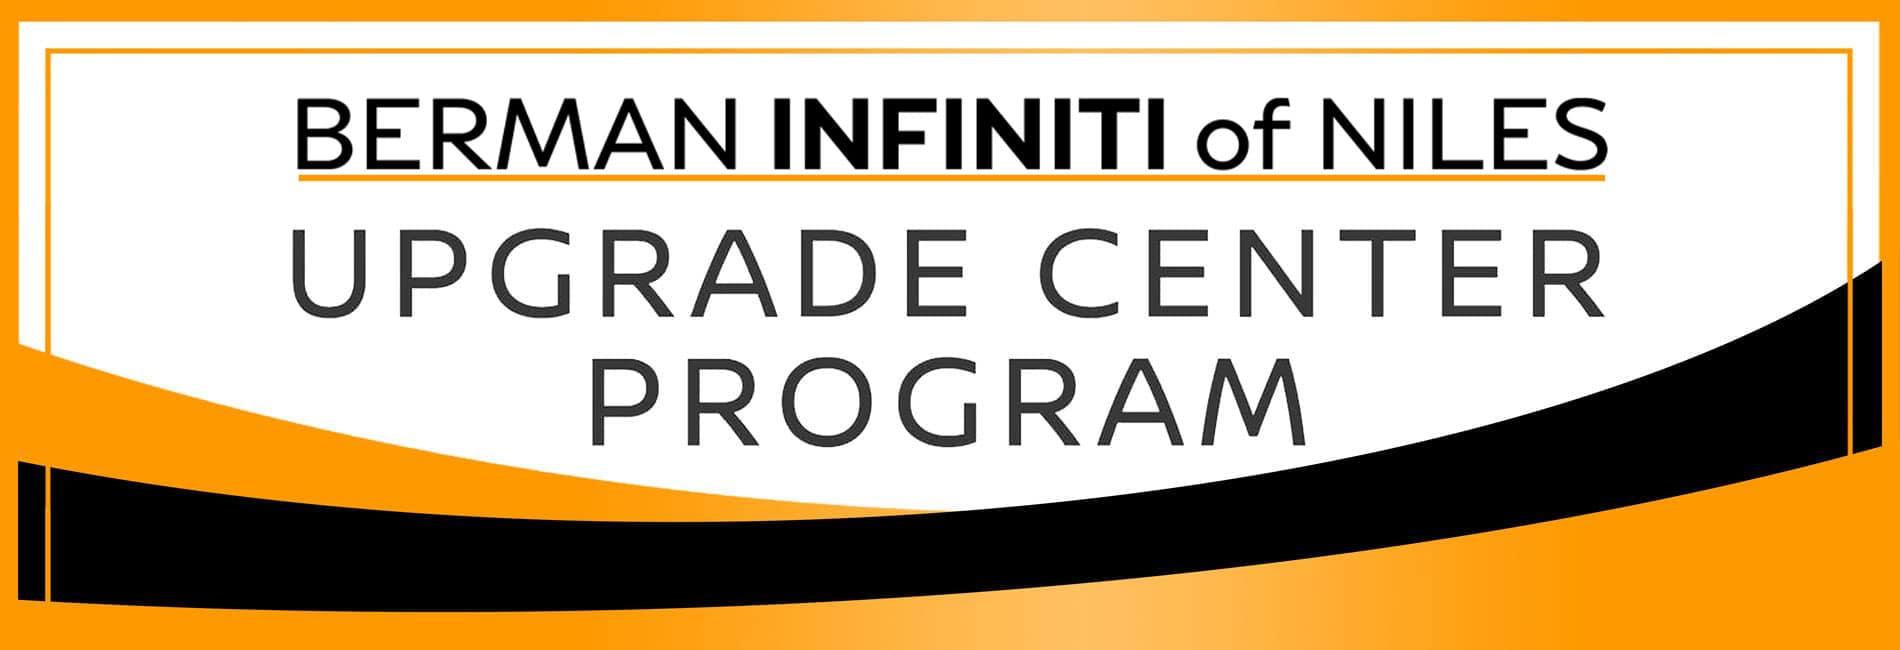 Upgrade Center at Berman INFINITI of Niles